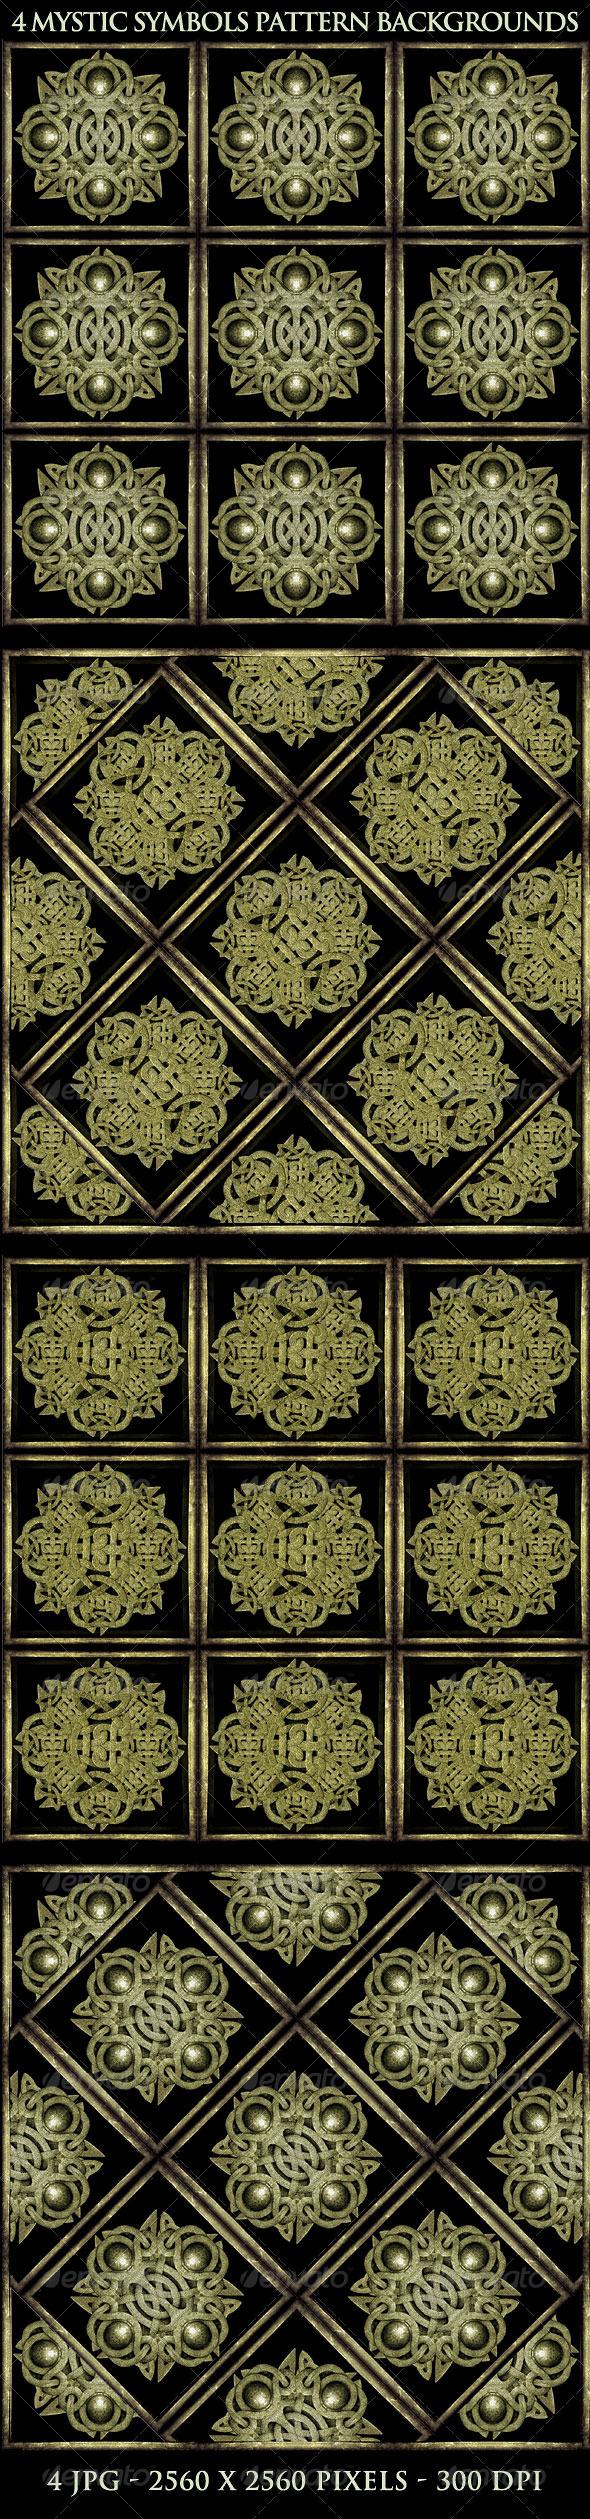 GraphicRiver 4 Mystic Symbols Background Patterns 5417351